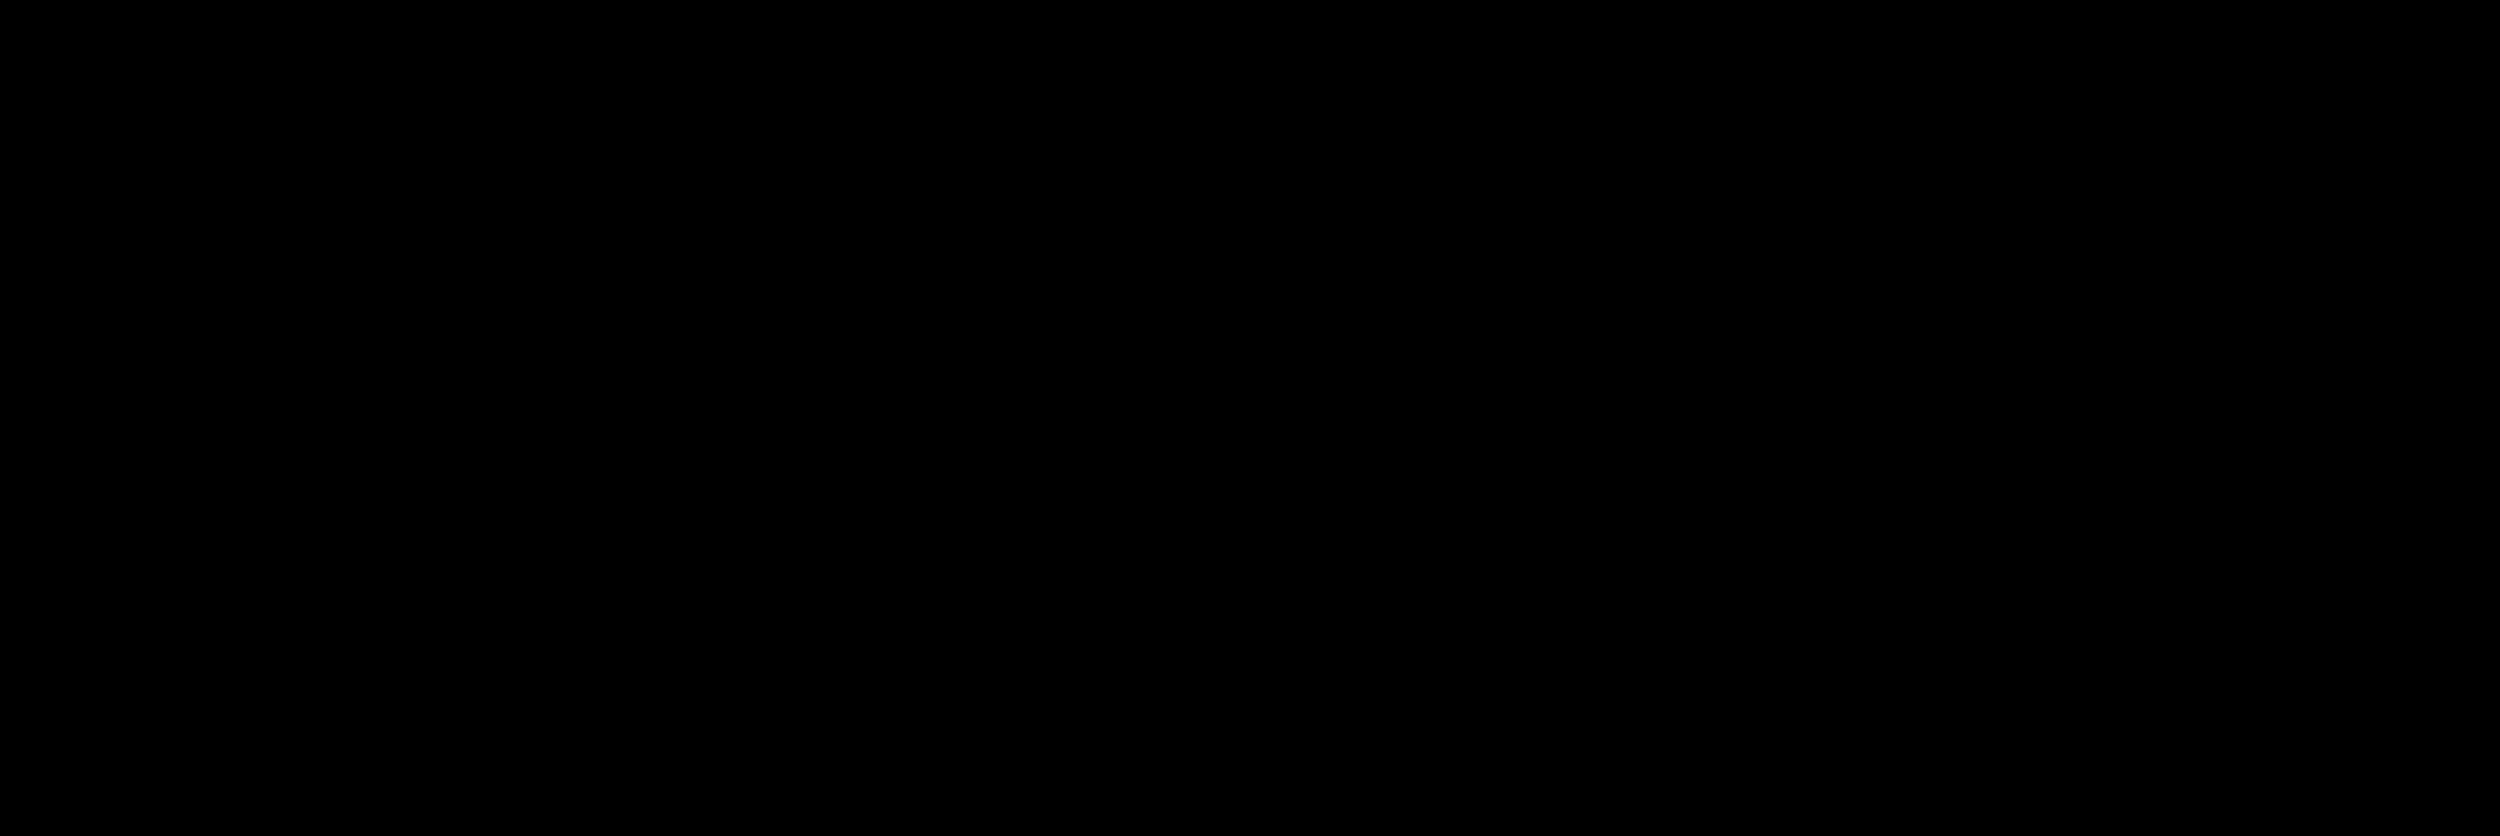 Logo designed by Stephanie Winarto